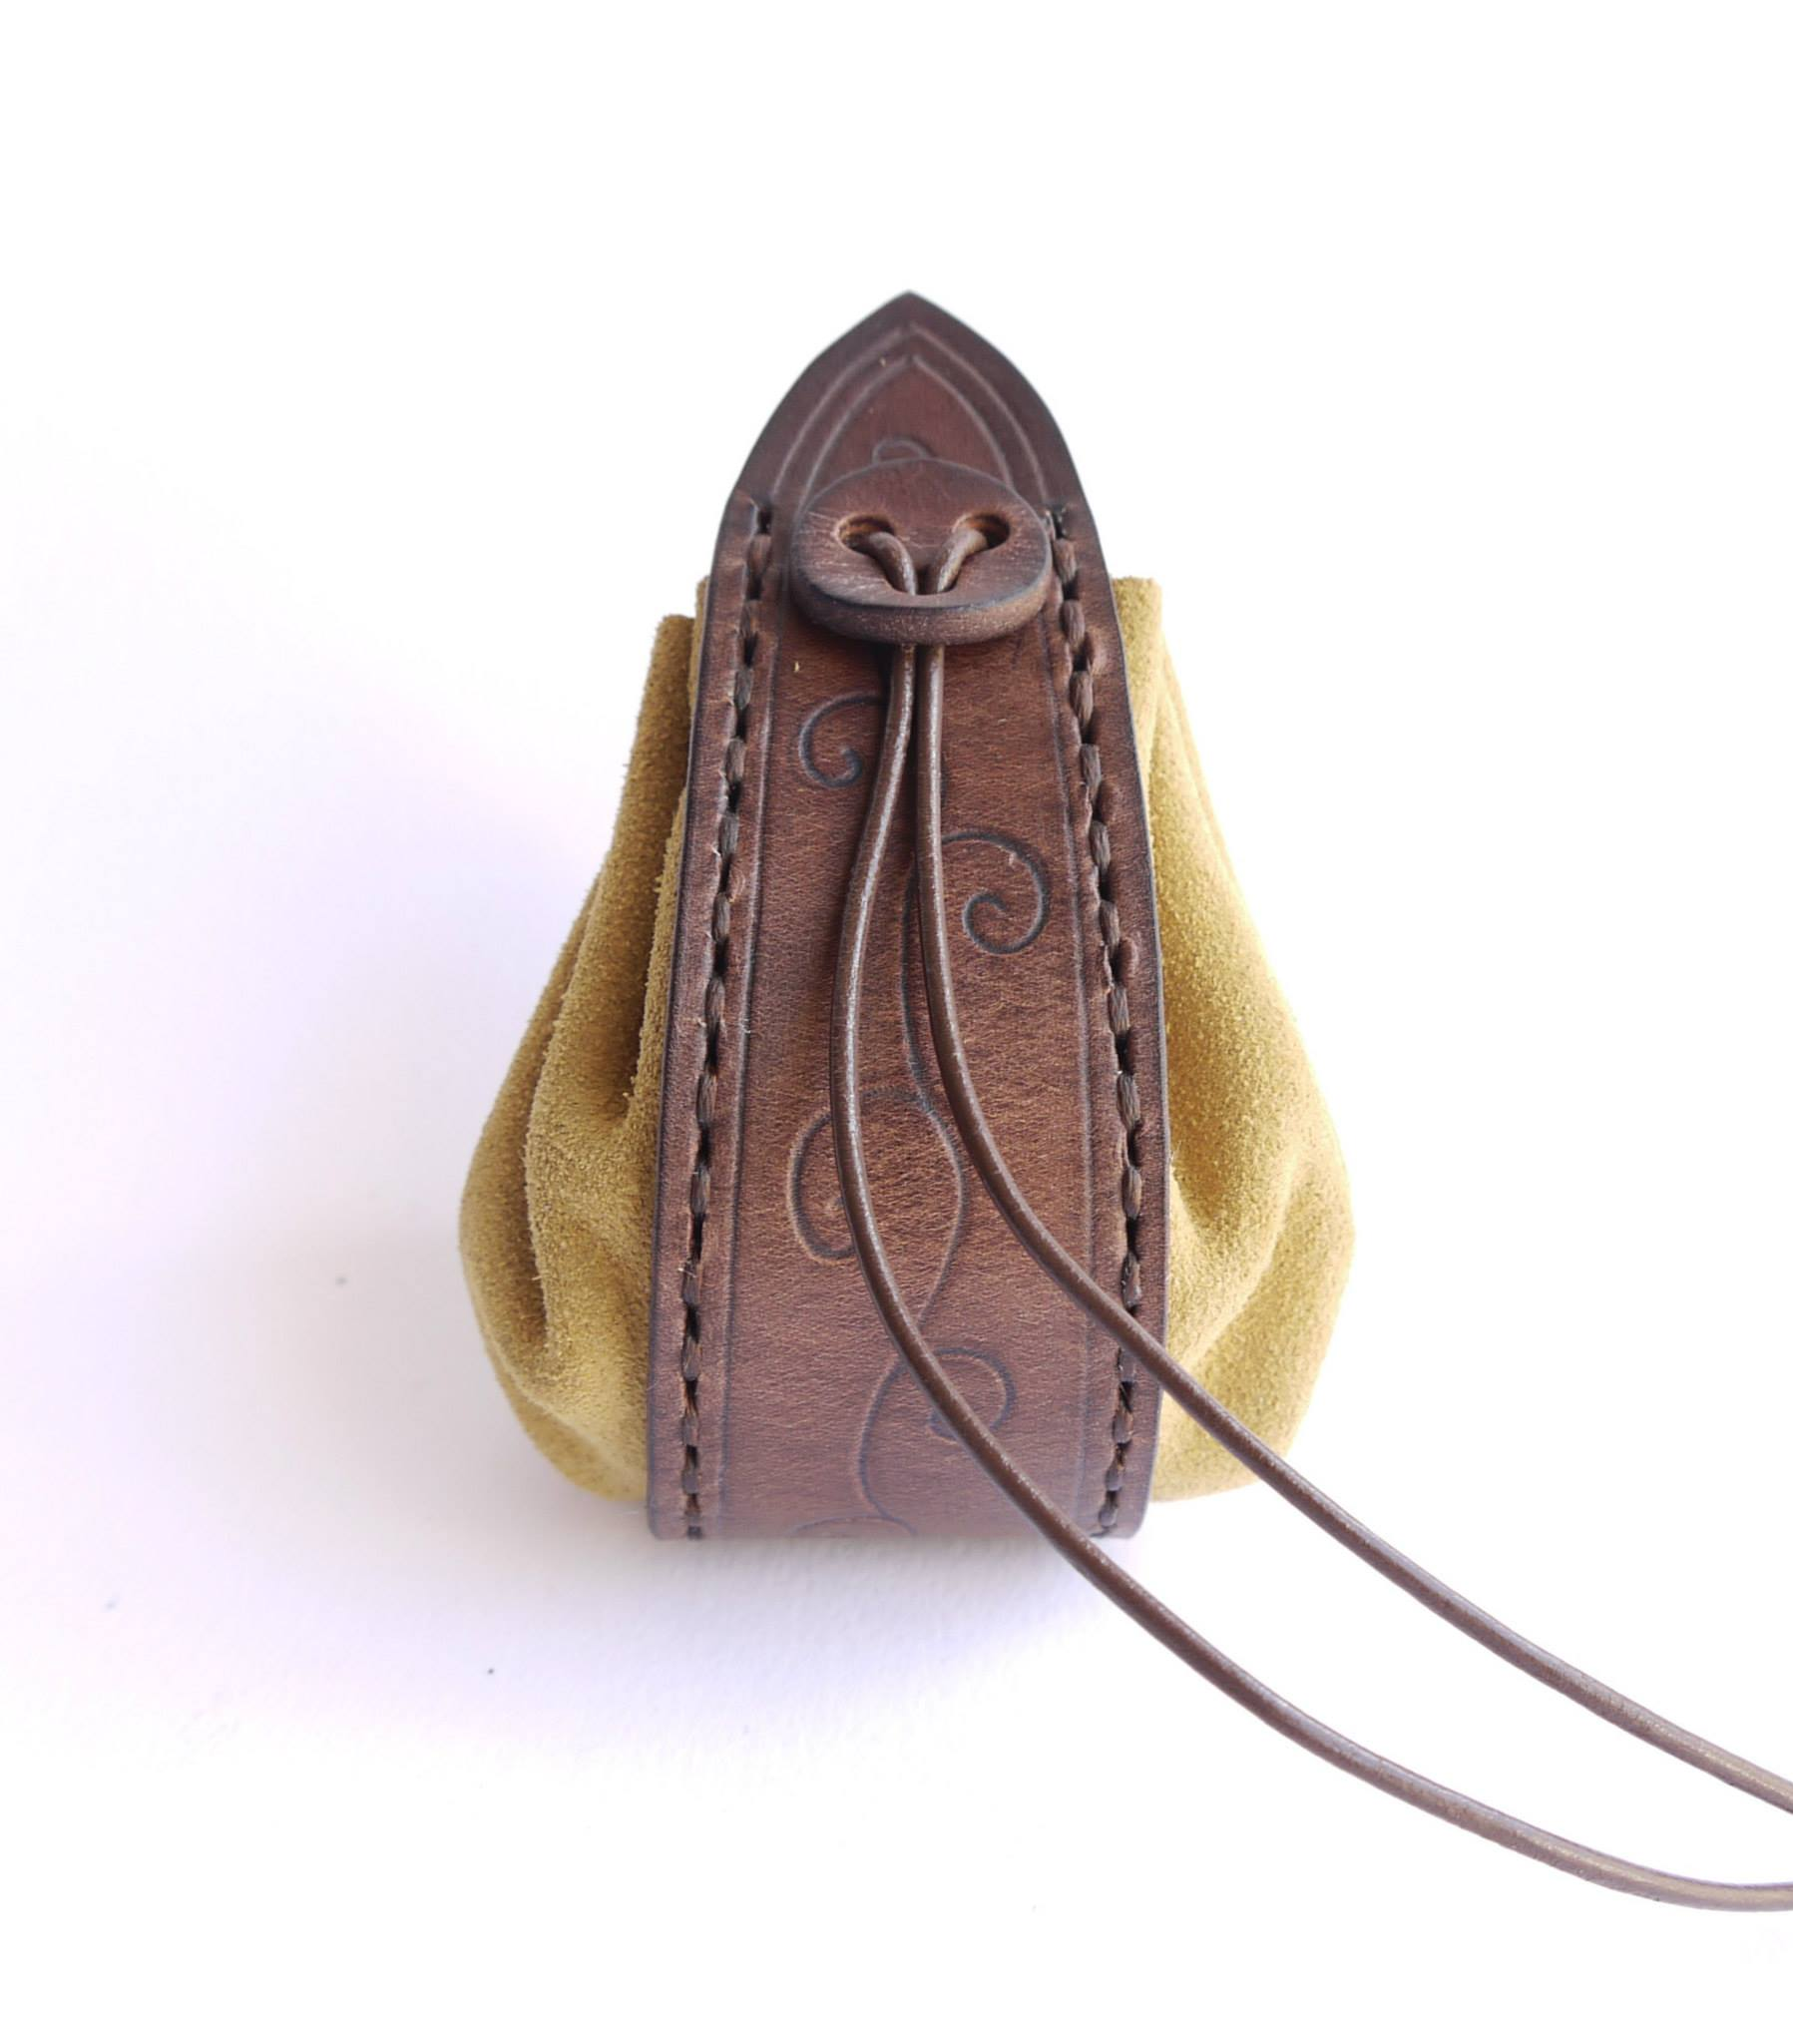 L Atelier de Maître Hobbit (Artisanat de cuir)   PortDragon.fr 9bf6753727d